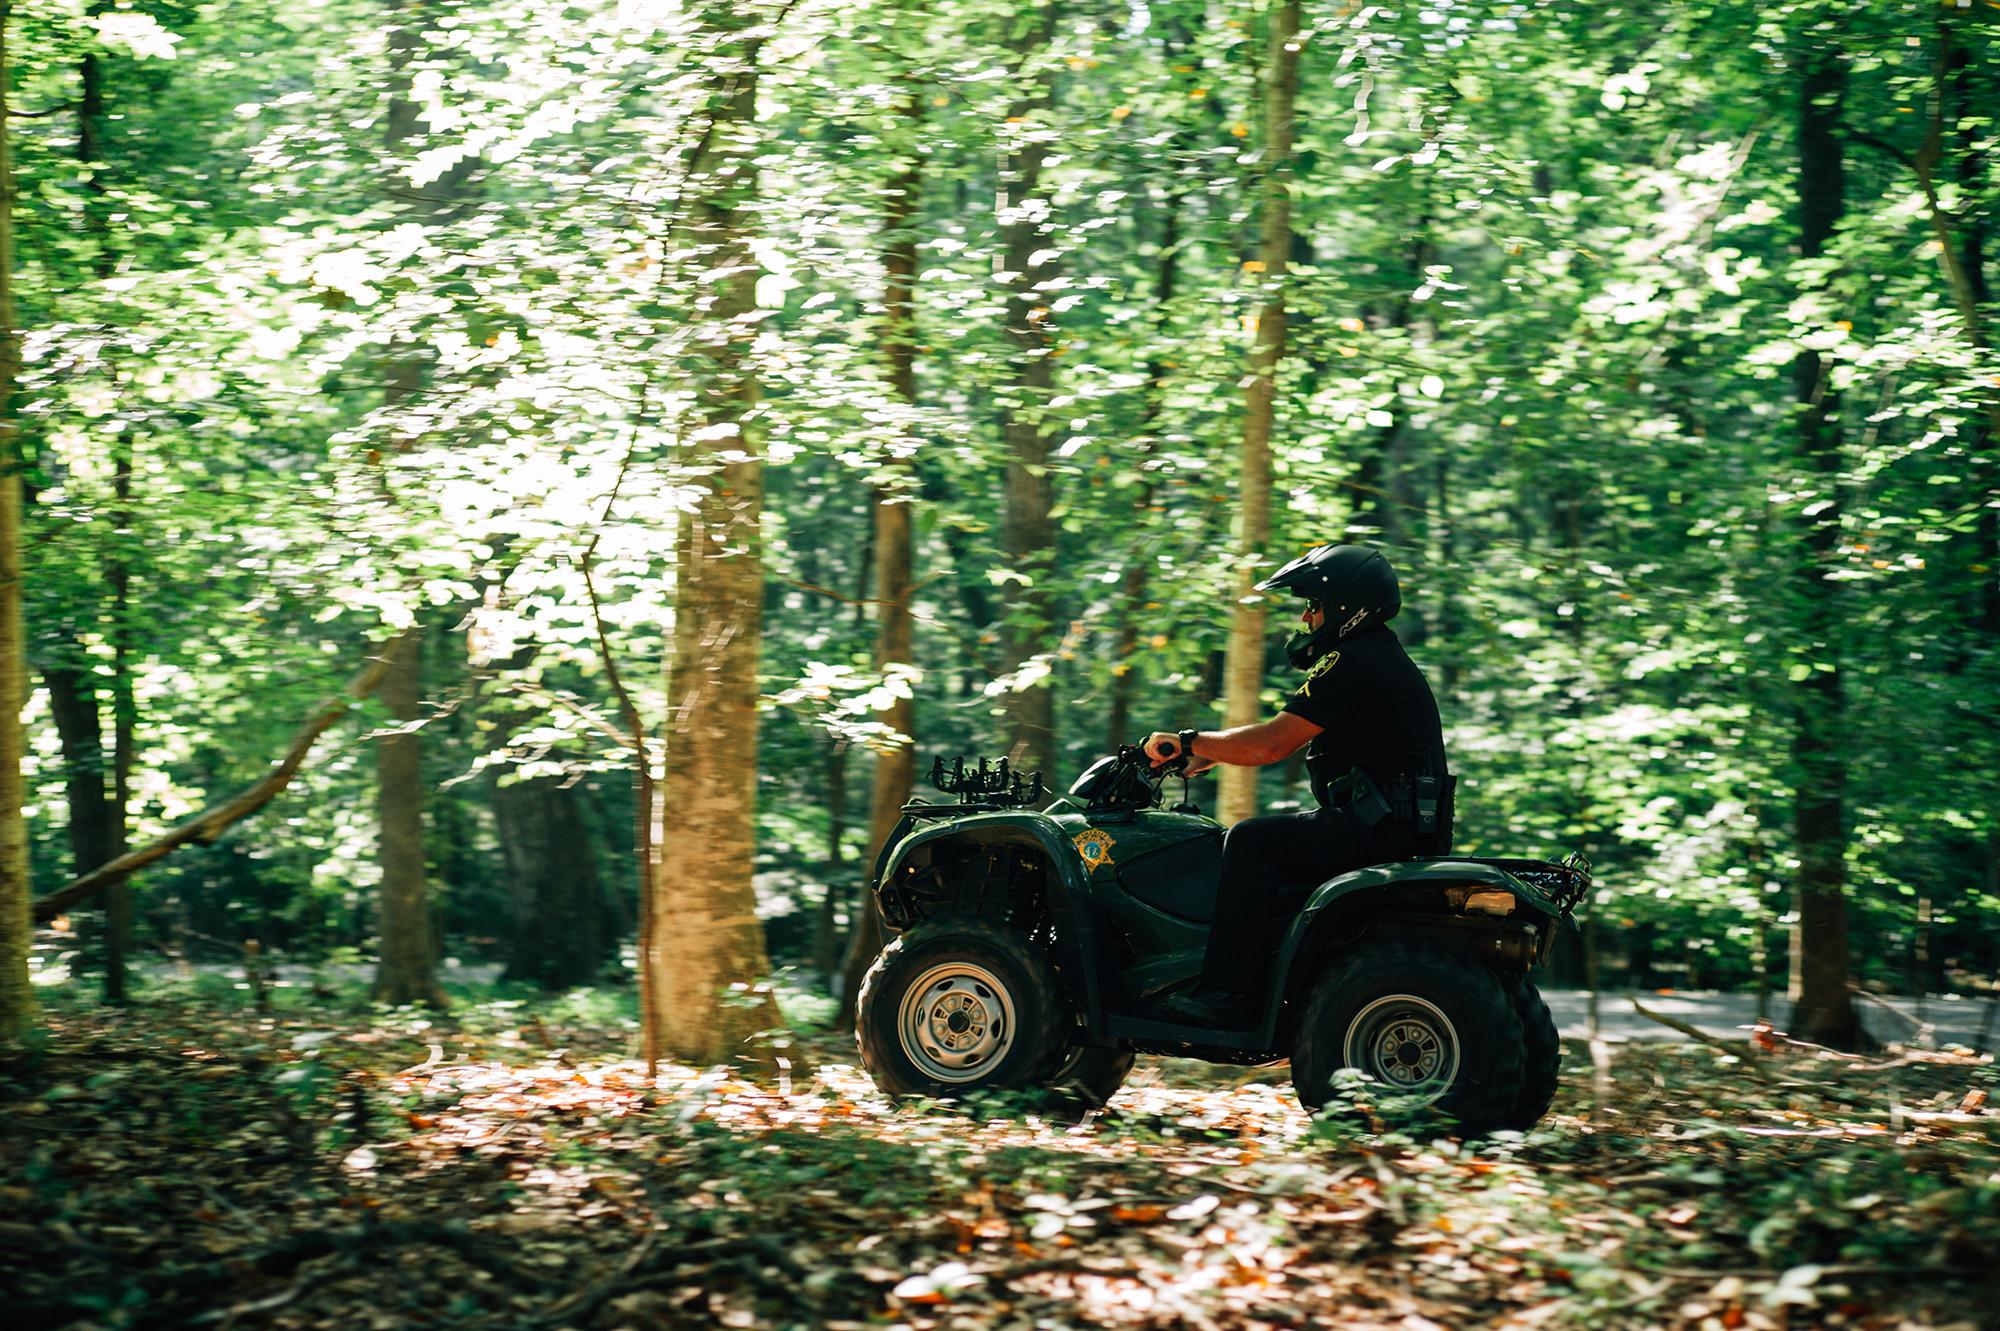 ATV (All-Terrain Vehicle) Unit